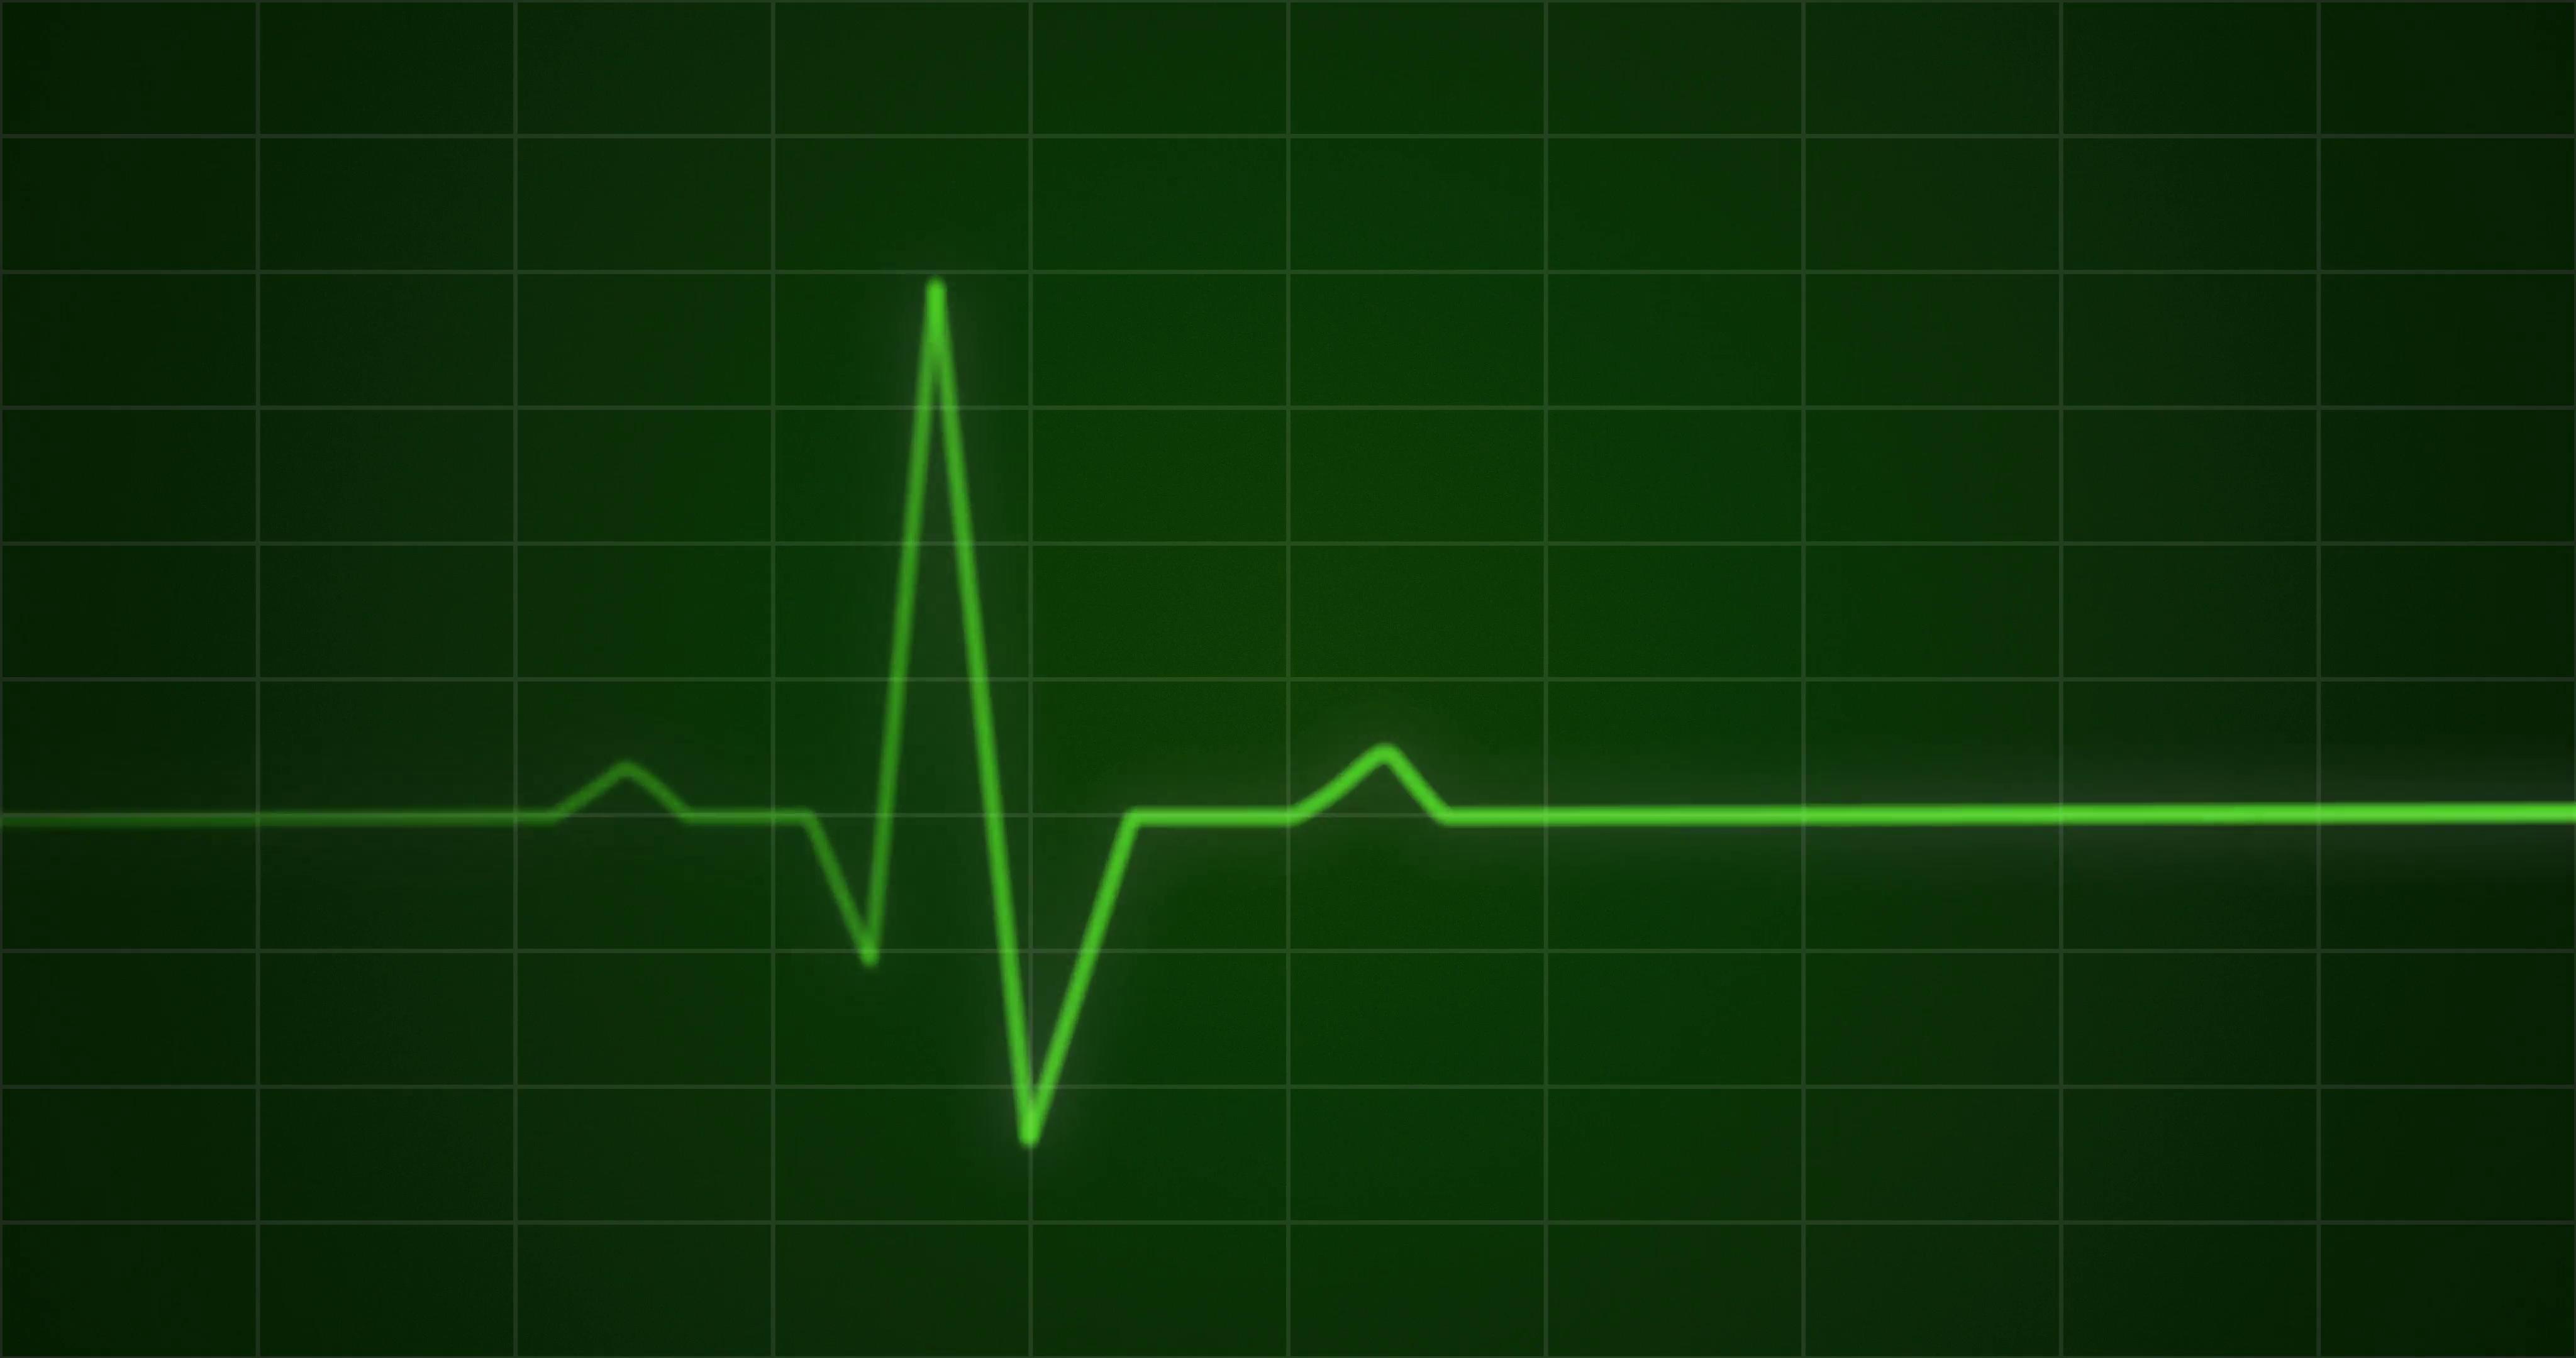 Concept animation of an ECG or EKG heartbeat cardiogram on a green ...